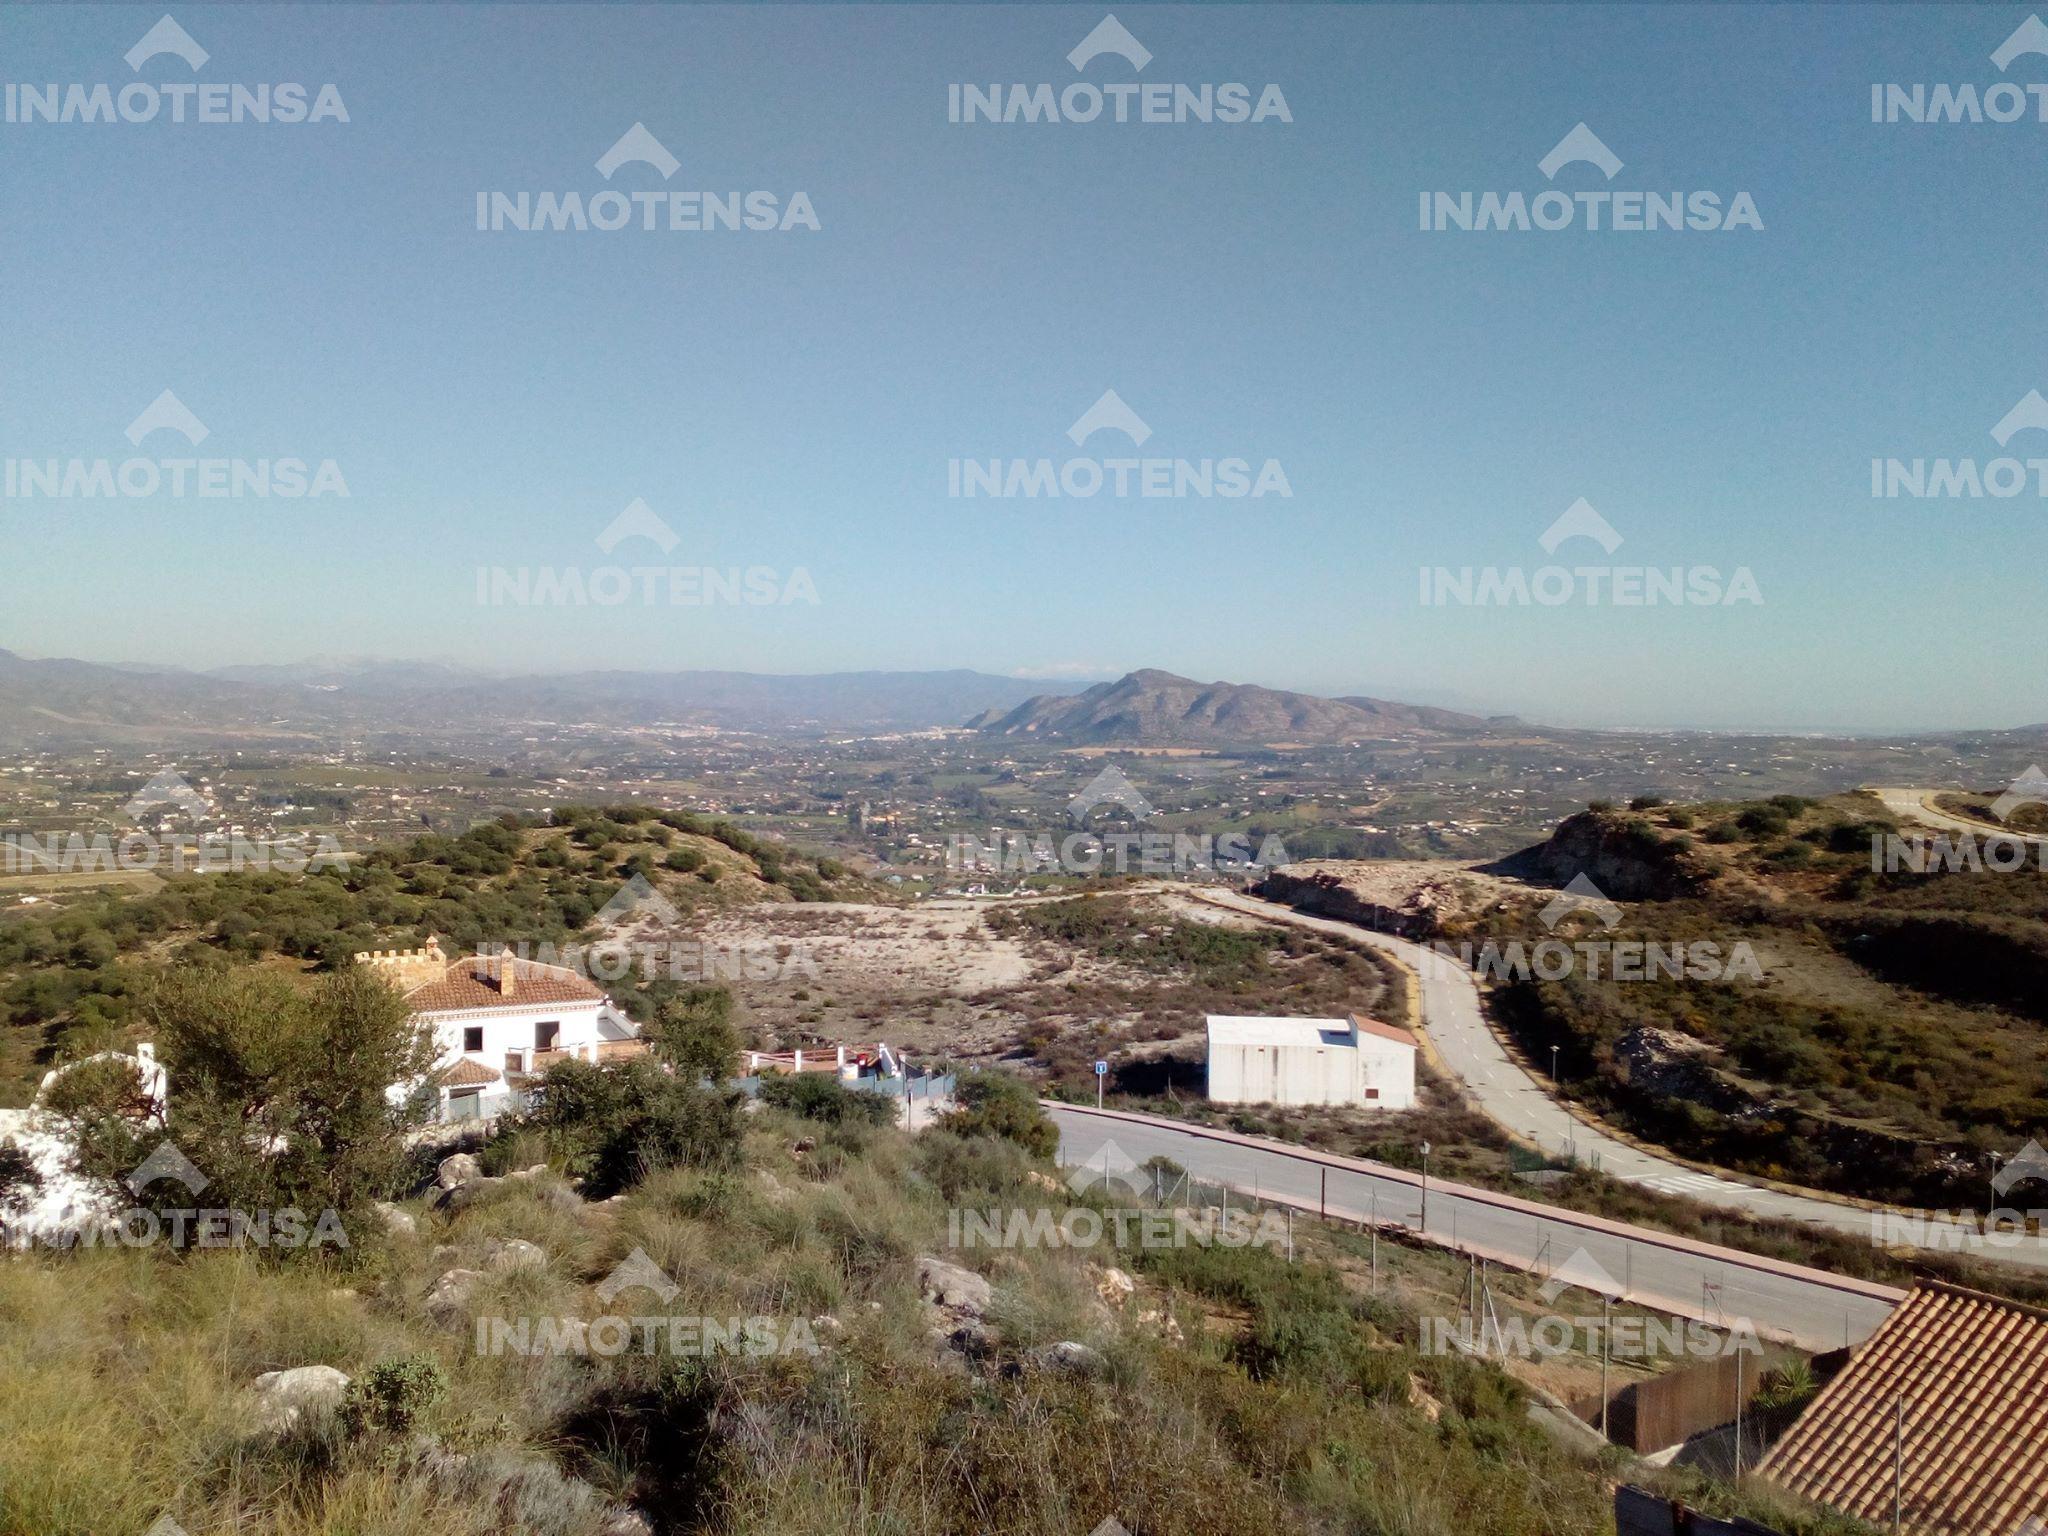 Parcela de 600 m2 en Sierra Gorda, Coín, Málaga